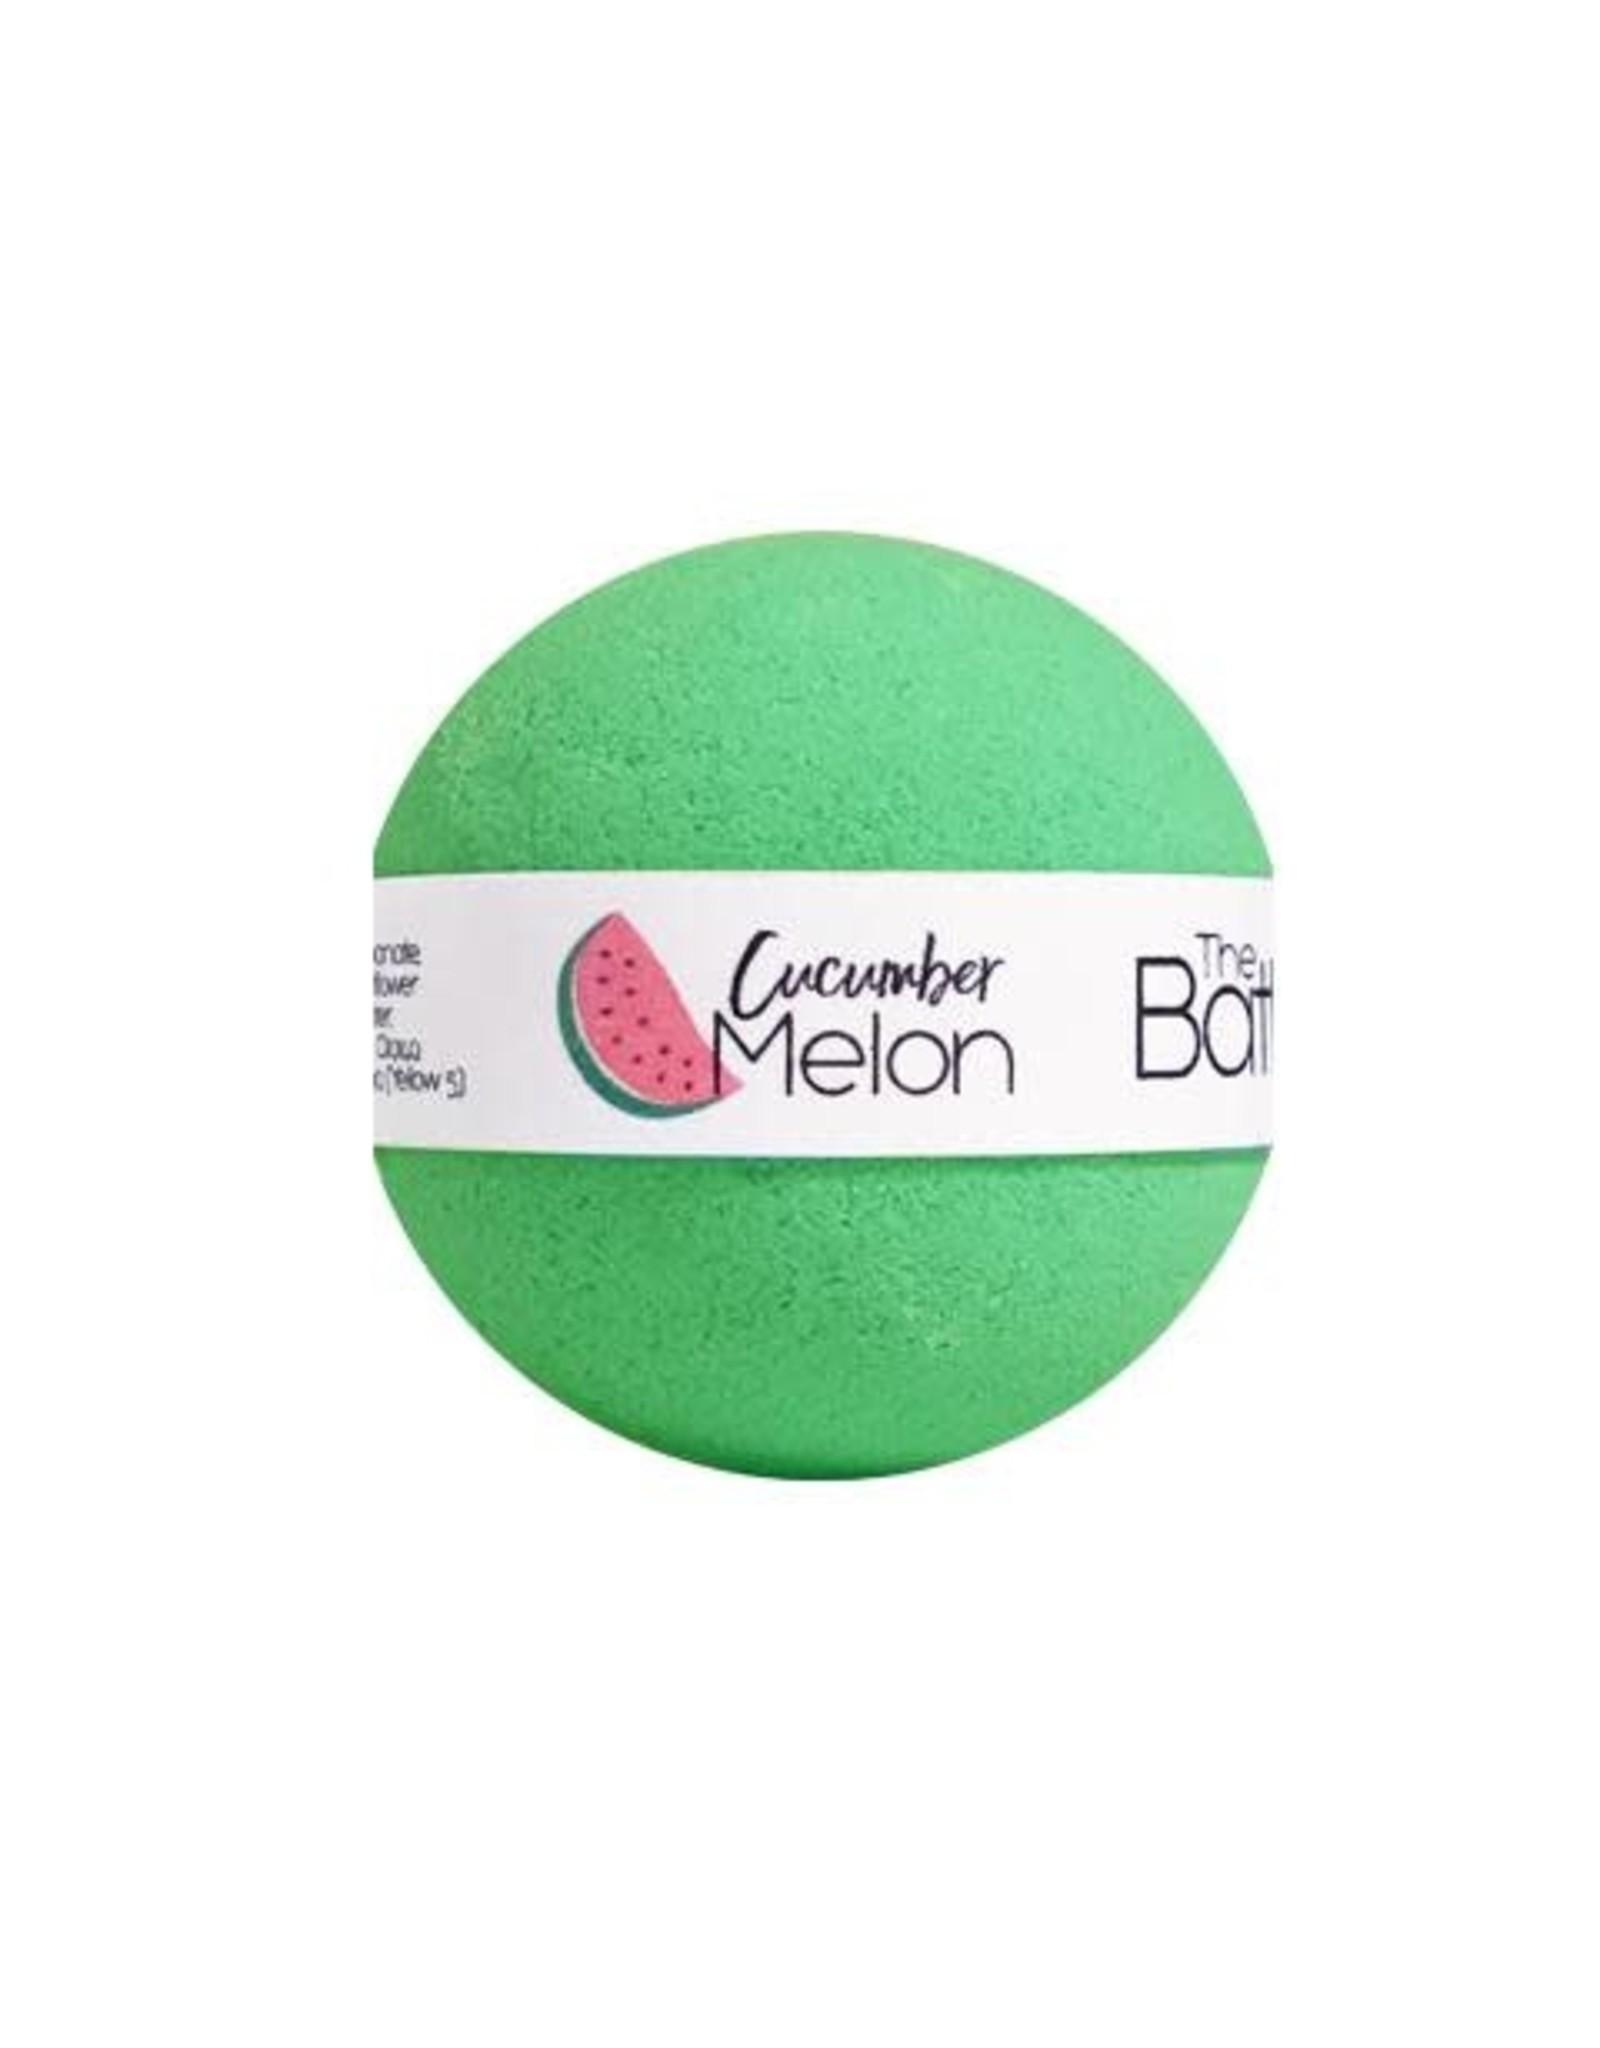 The Bath Bomb Co Bath Bomb Mini - Cucumber Melon - 95g